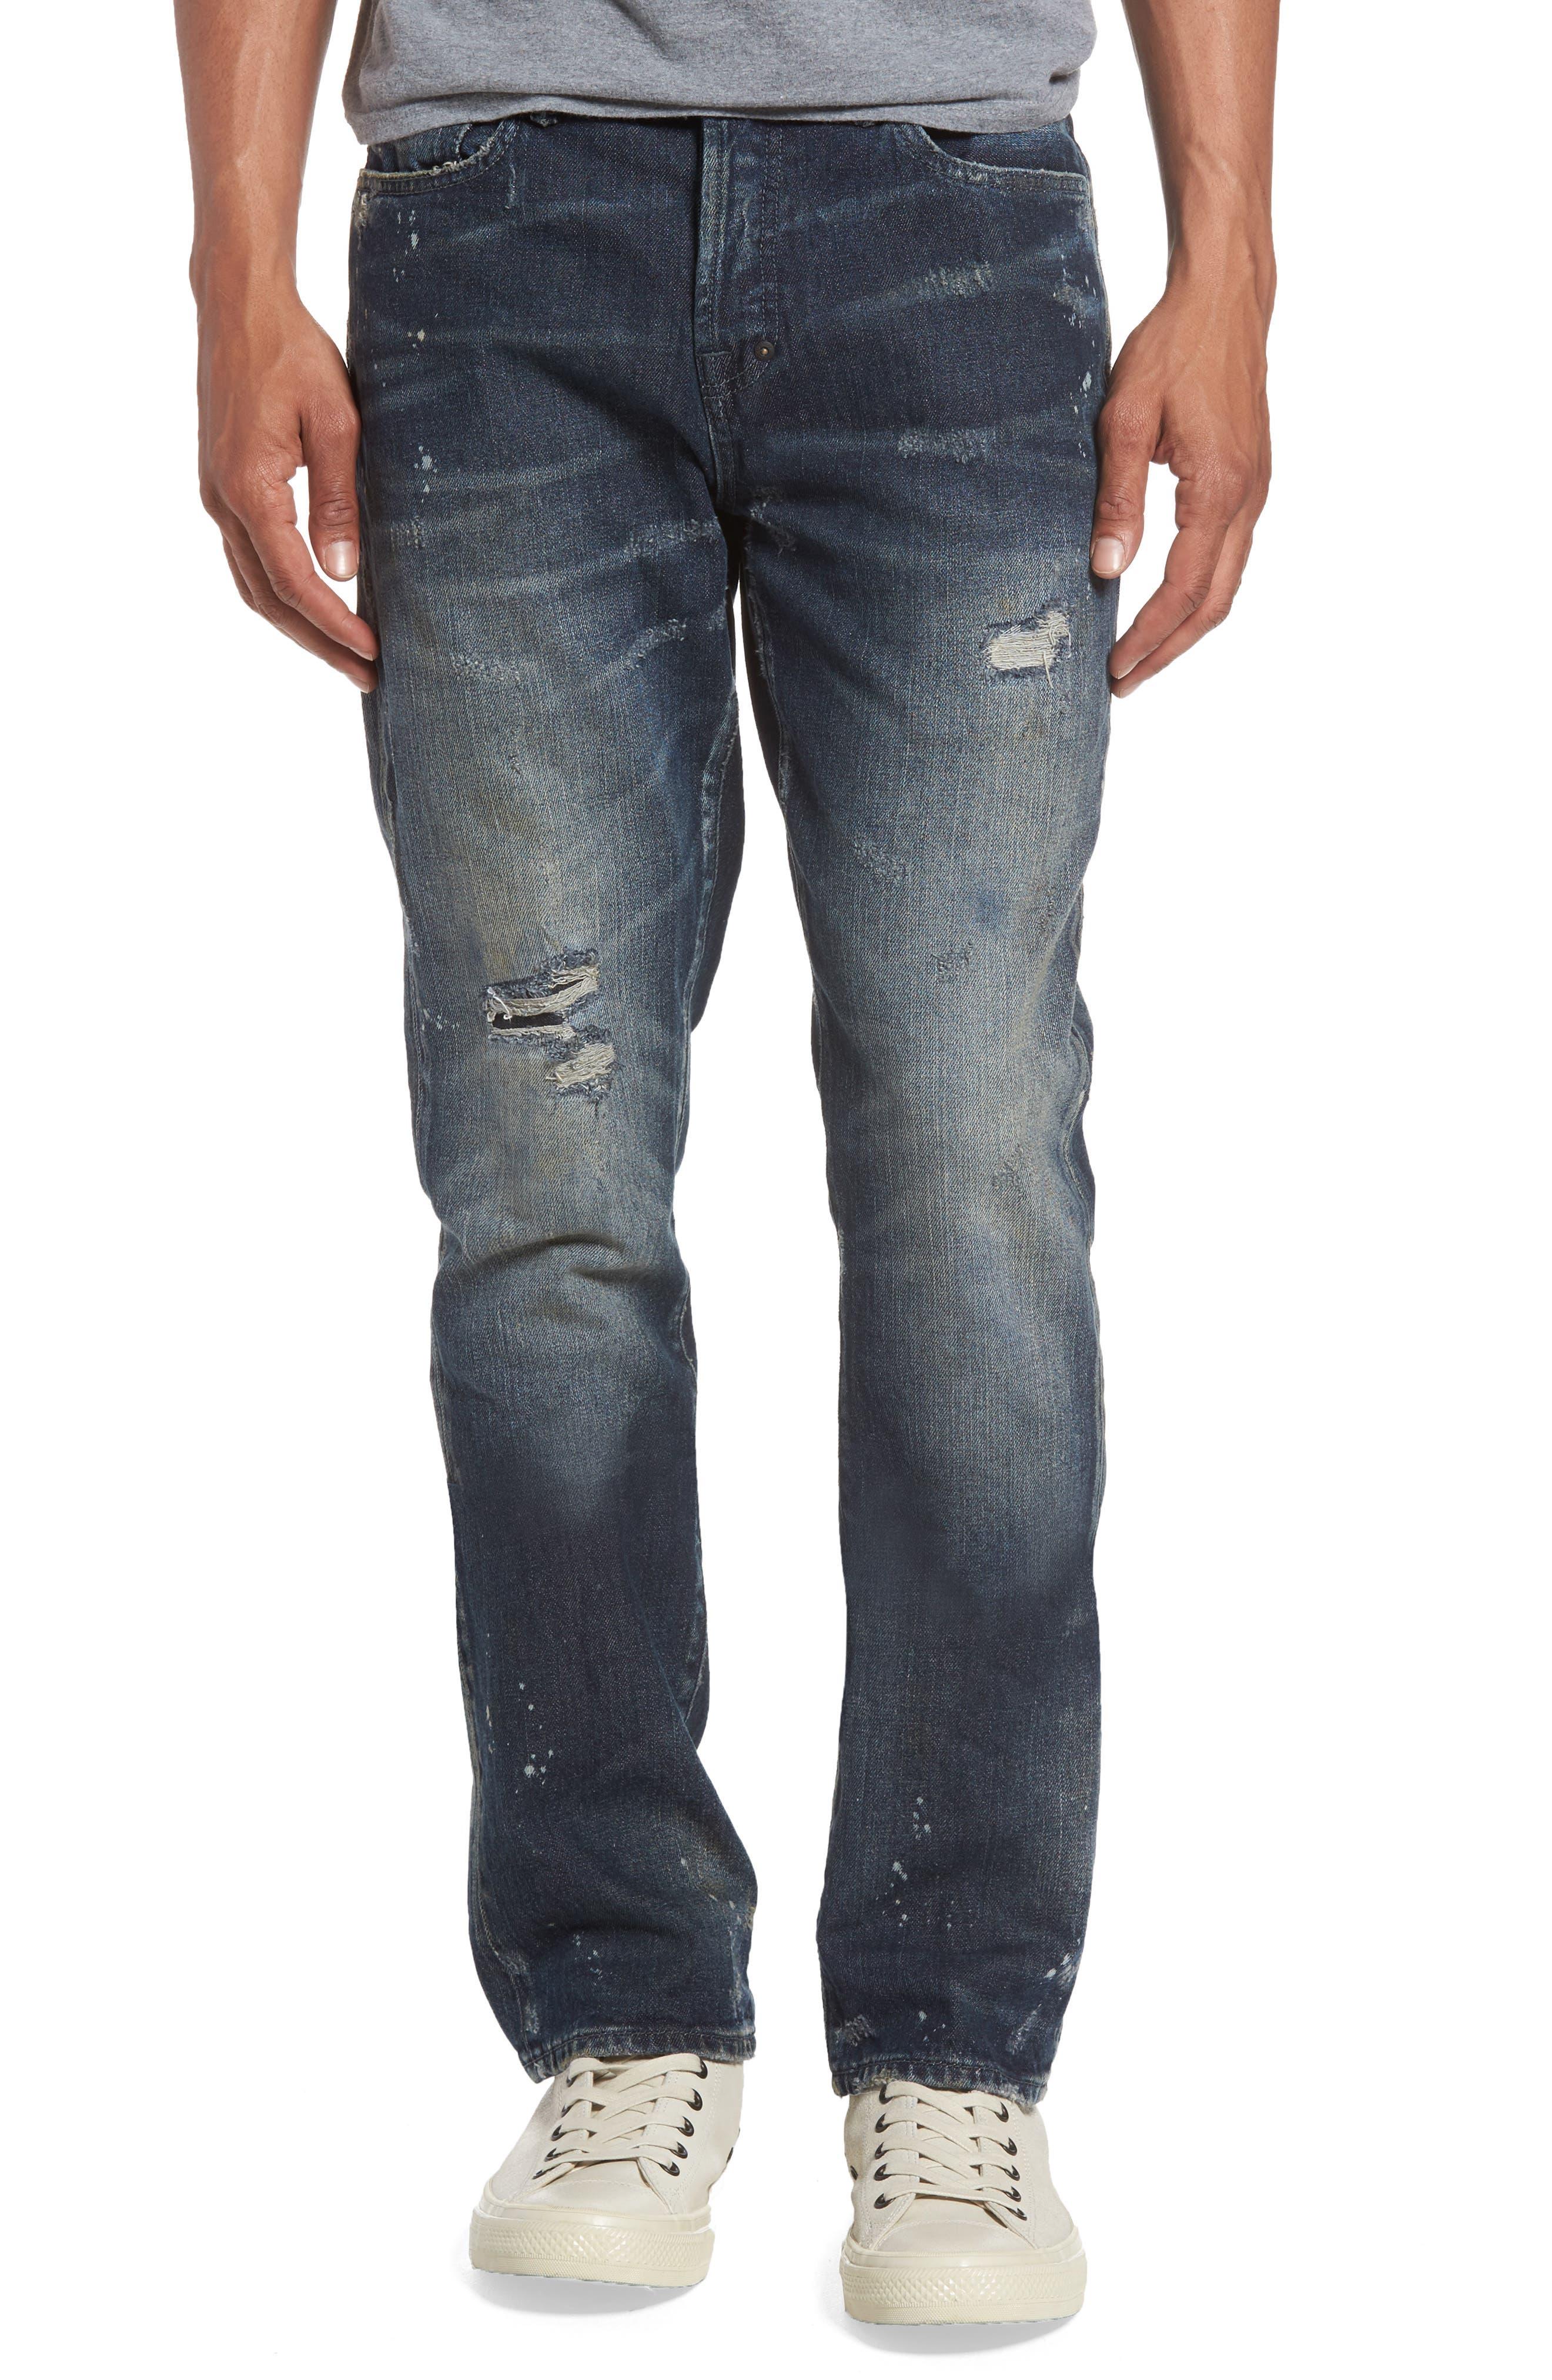 Demon Slim Straight Leg Jeans,                         Main,                         color, Dark Wash